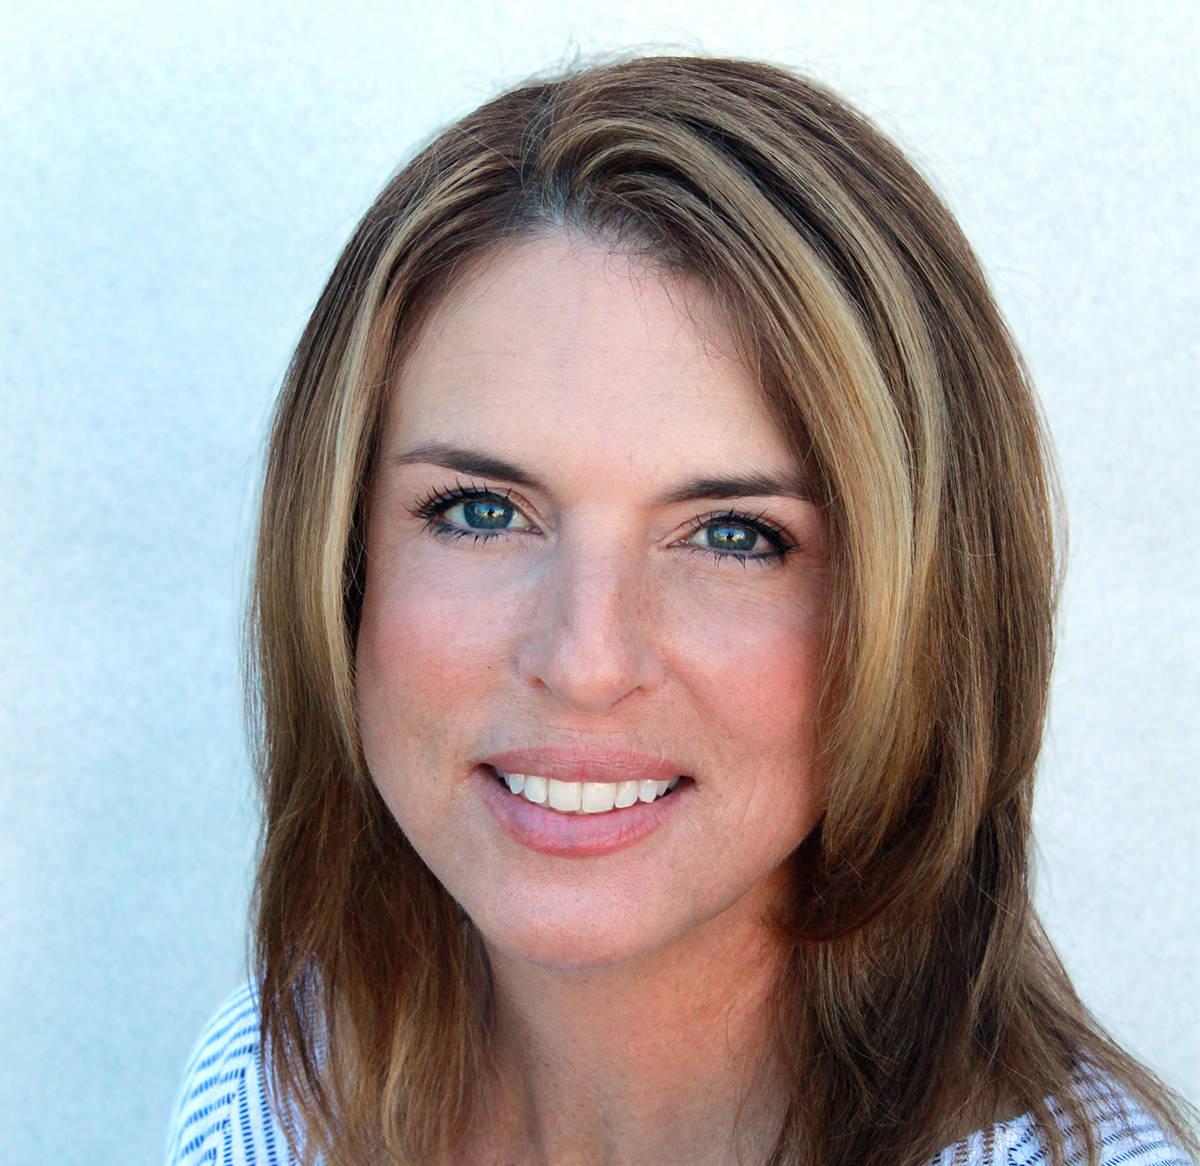 (Sherri Jorgensen) Sherri Jorgensen is a City Council candidate in the April 2021 primary.